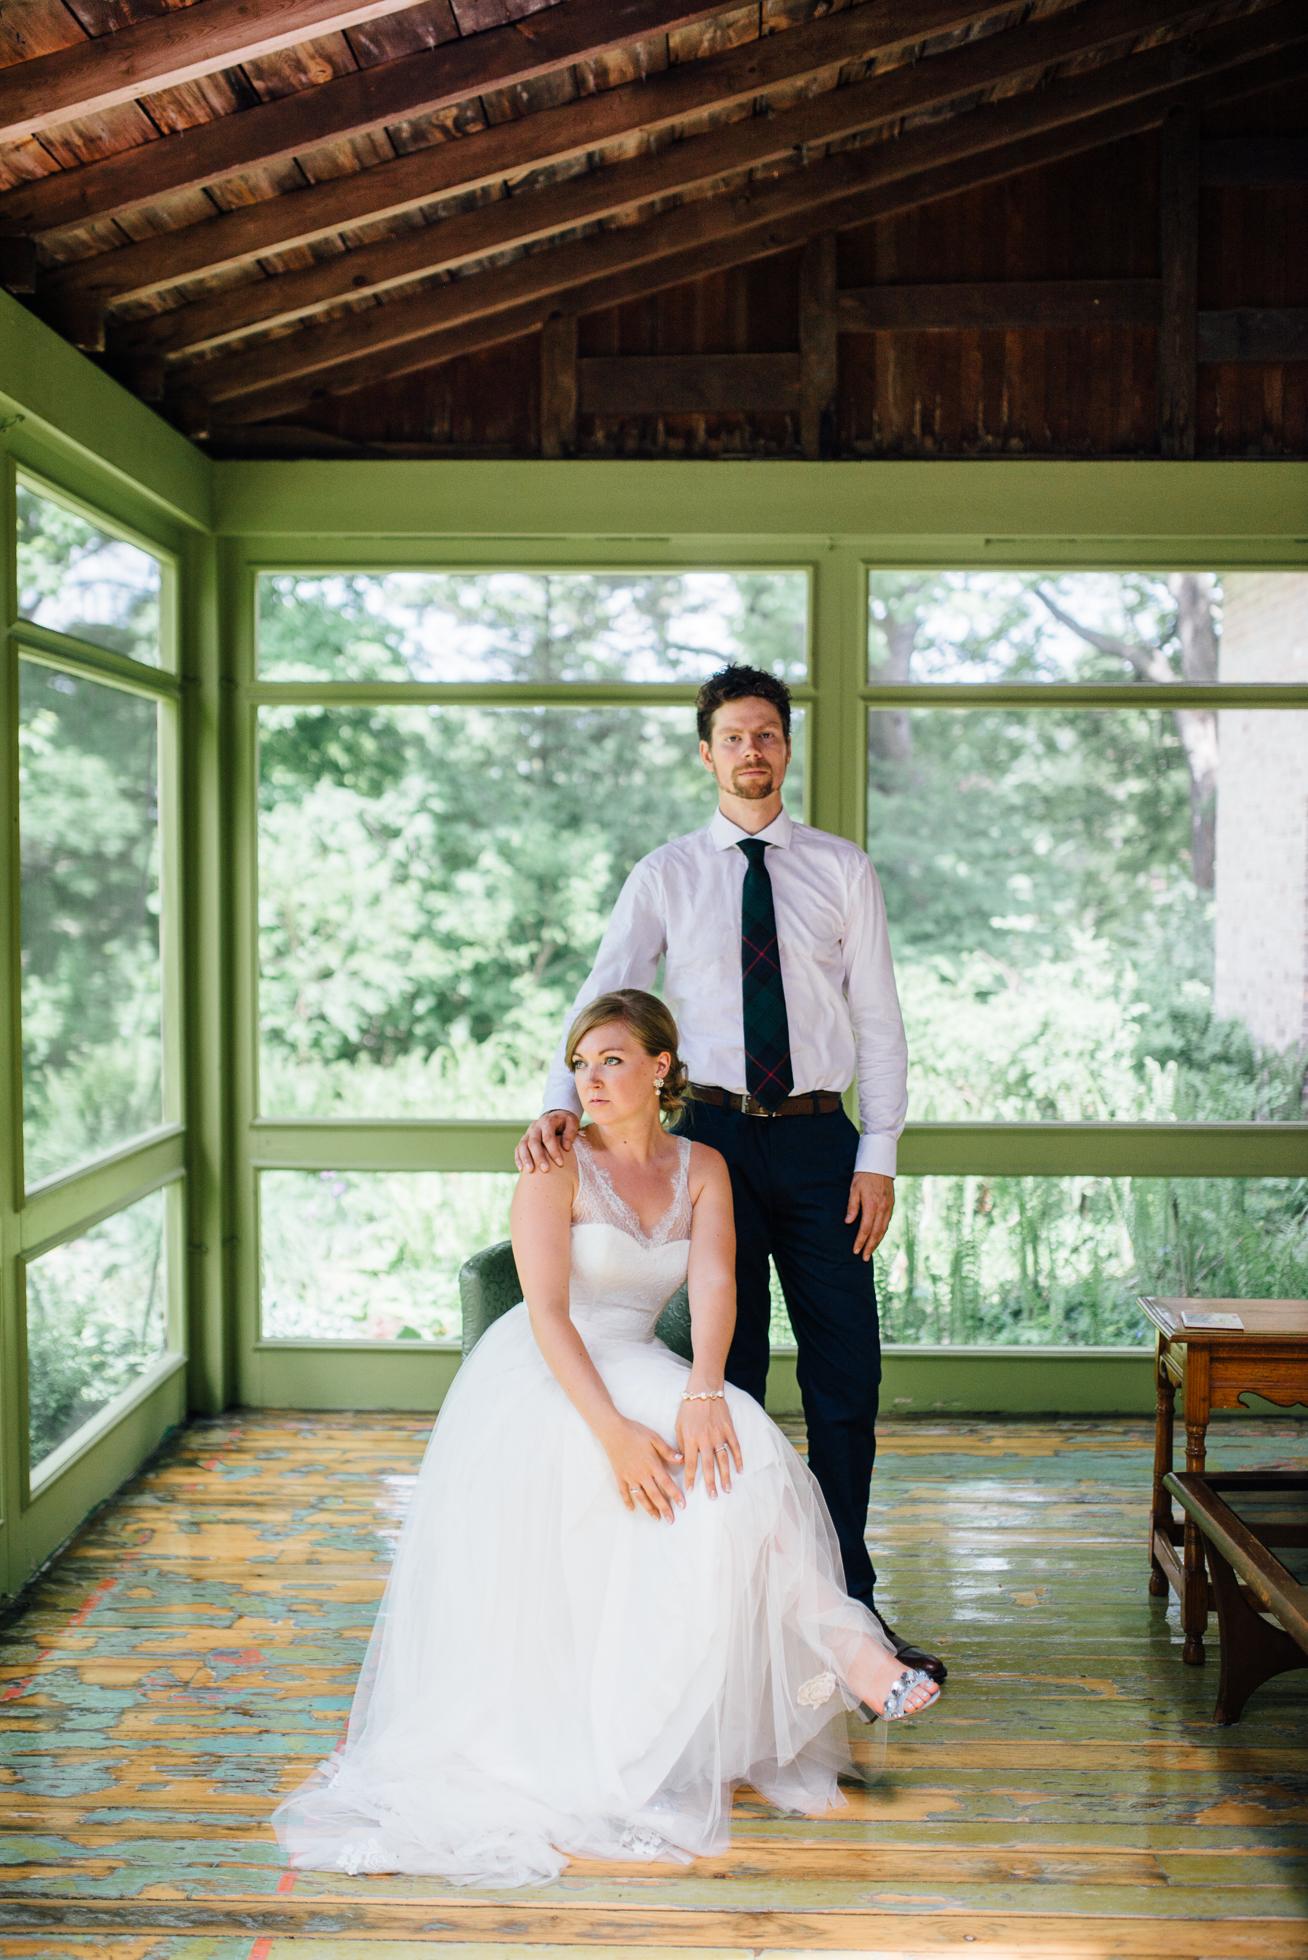 Outdoor-Caledon-Tralee-Wedding-Photography-36